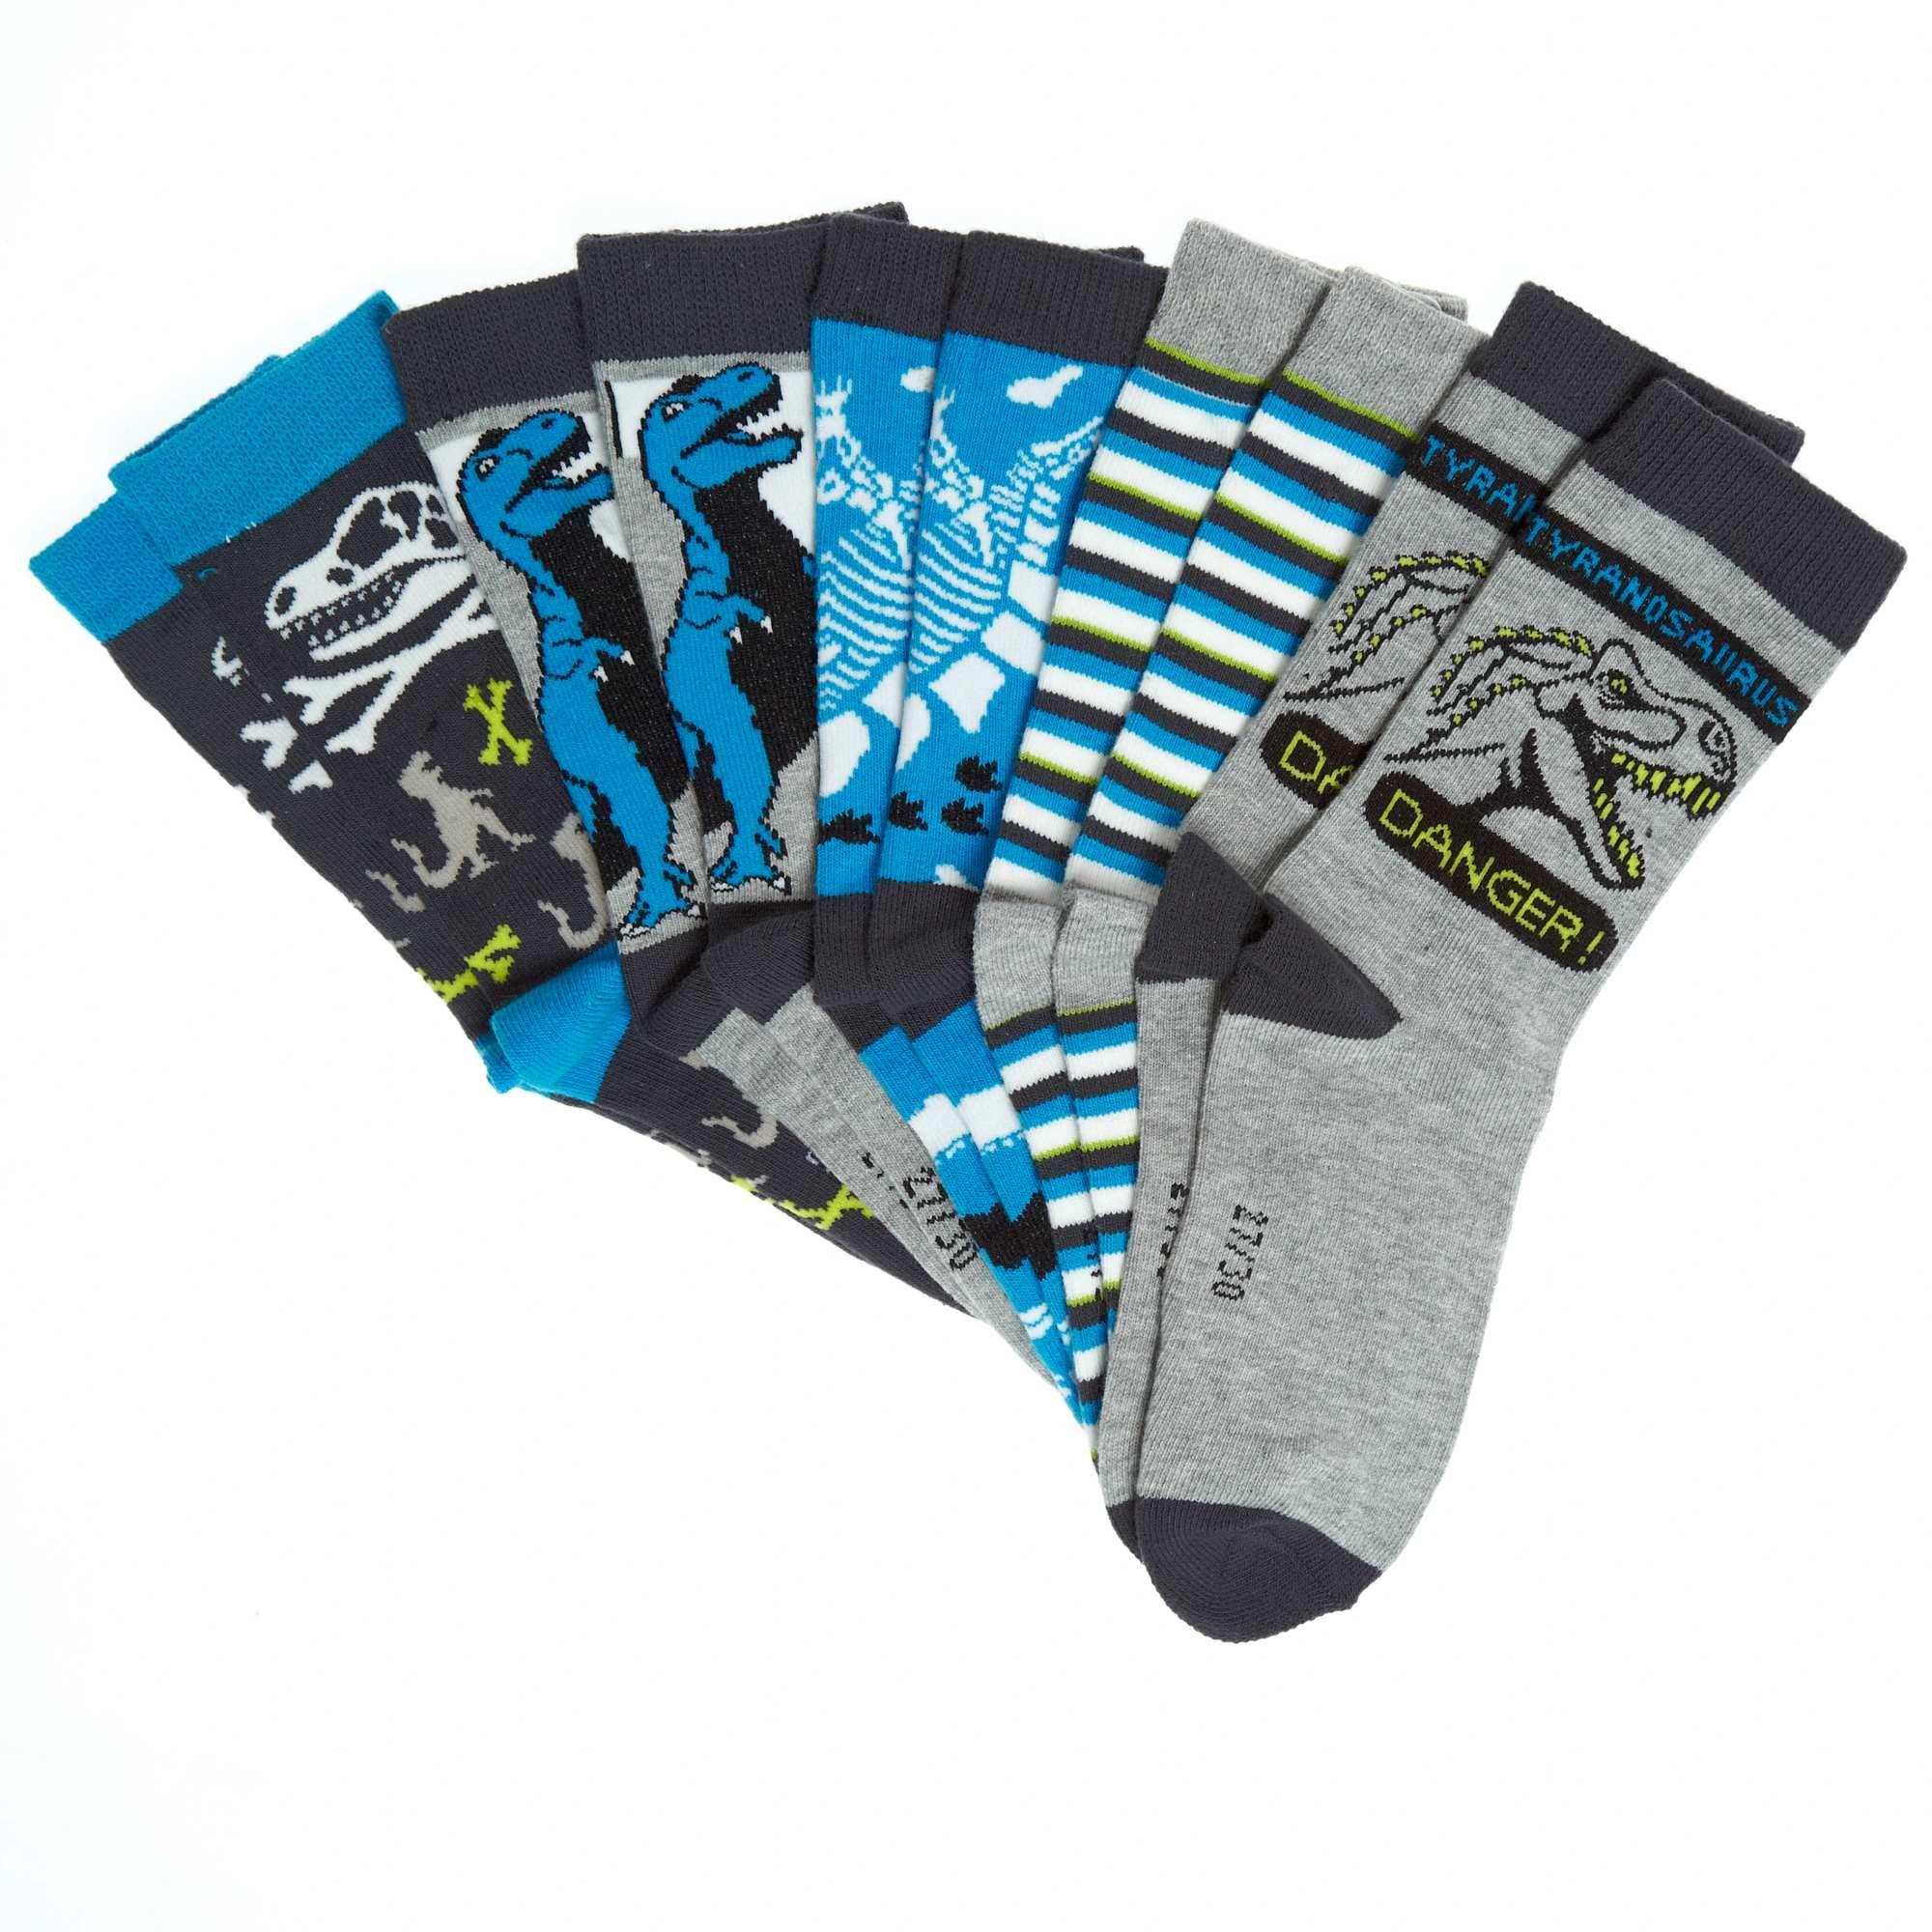 Pack de 5 pares de calcetines de dinosaurios Chico - Kiabi - 7,00€